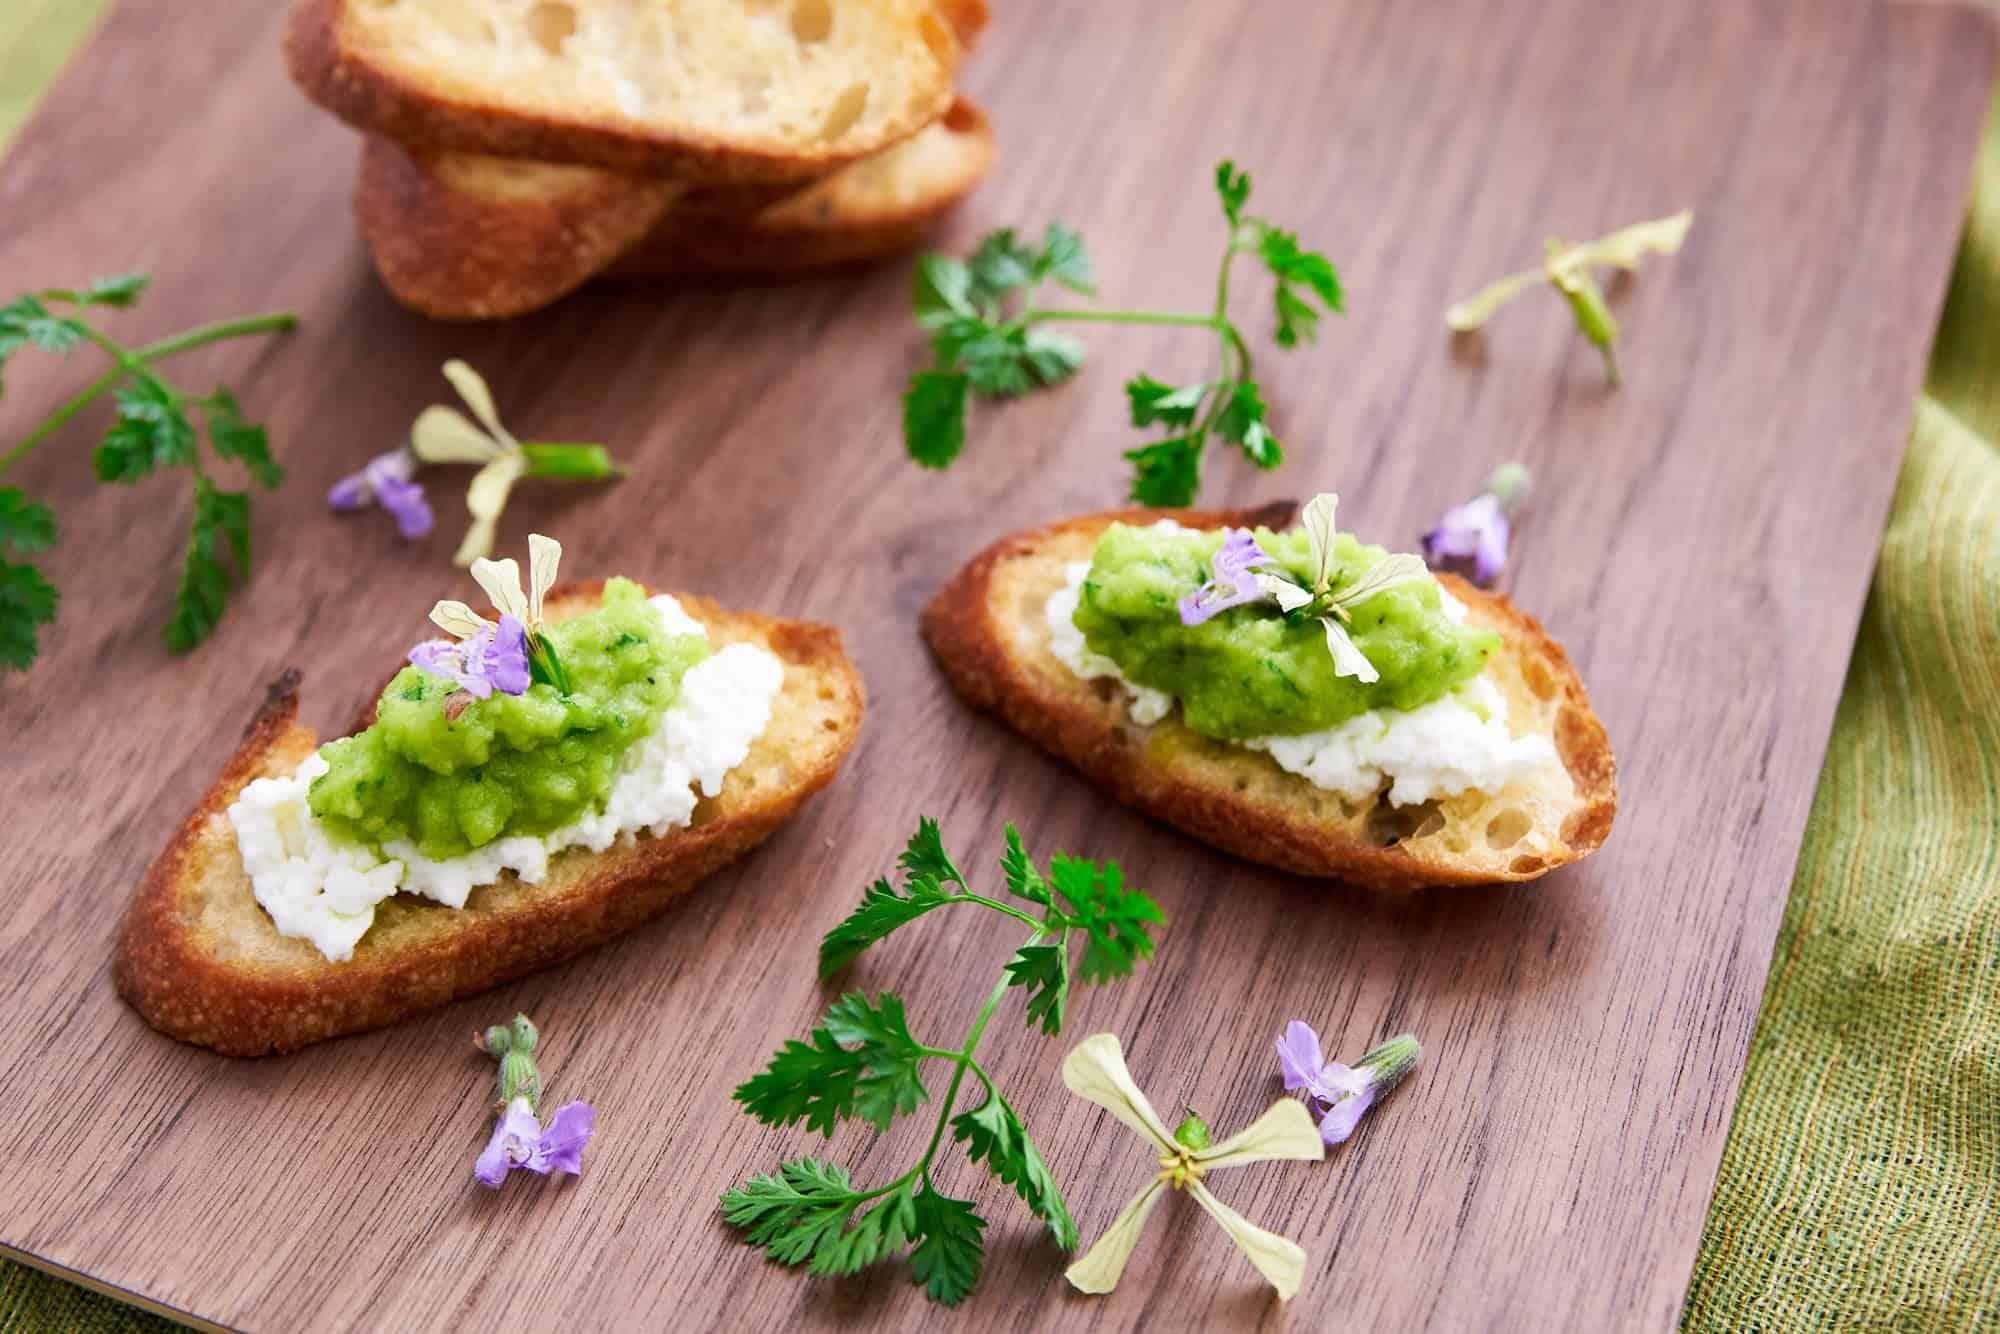 Perfect spring green pea pesto with ricotta spread on crostini.